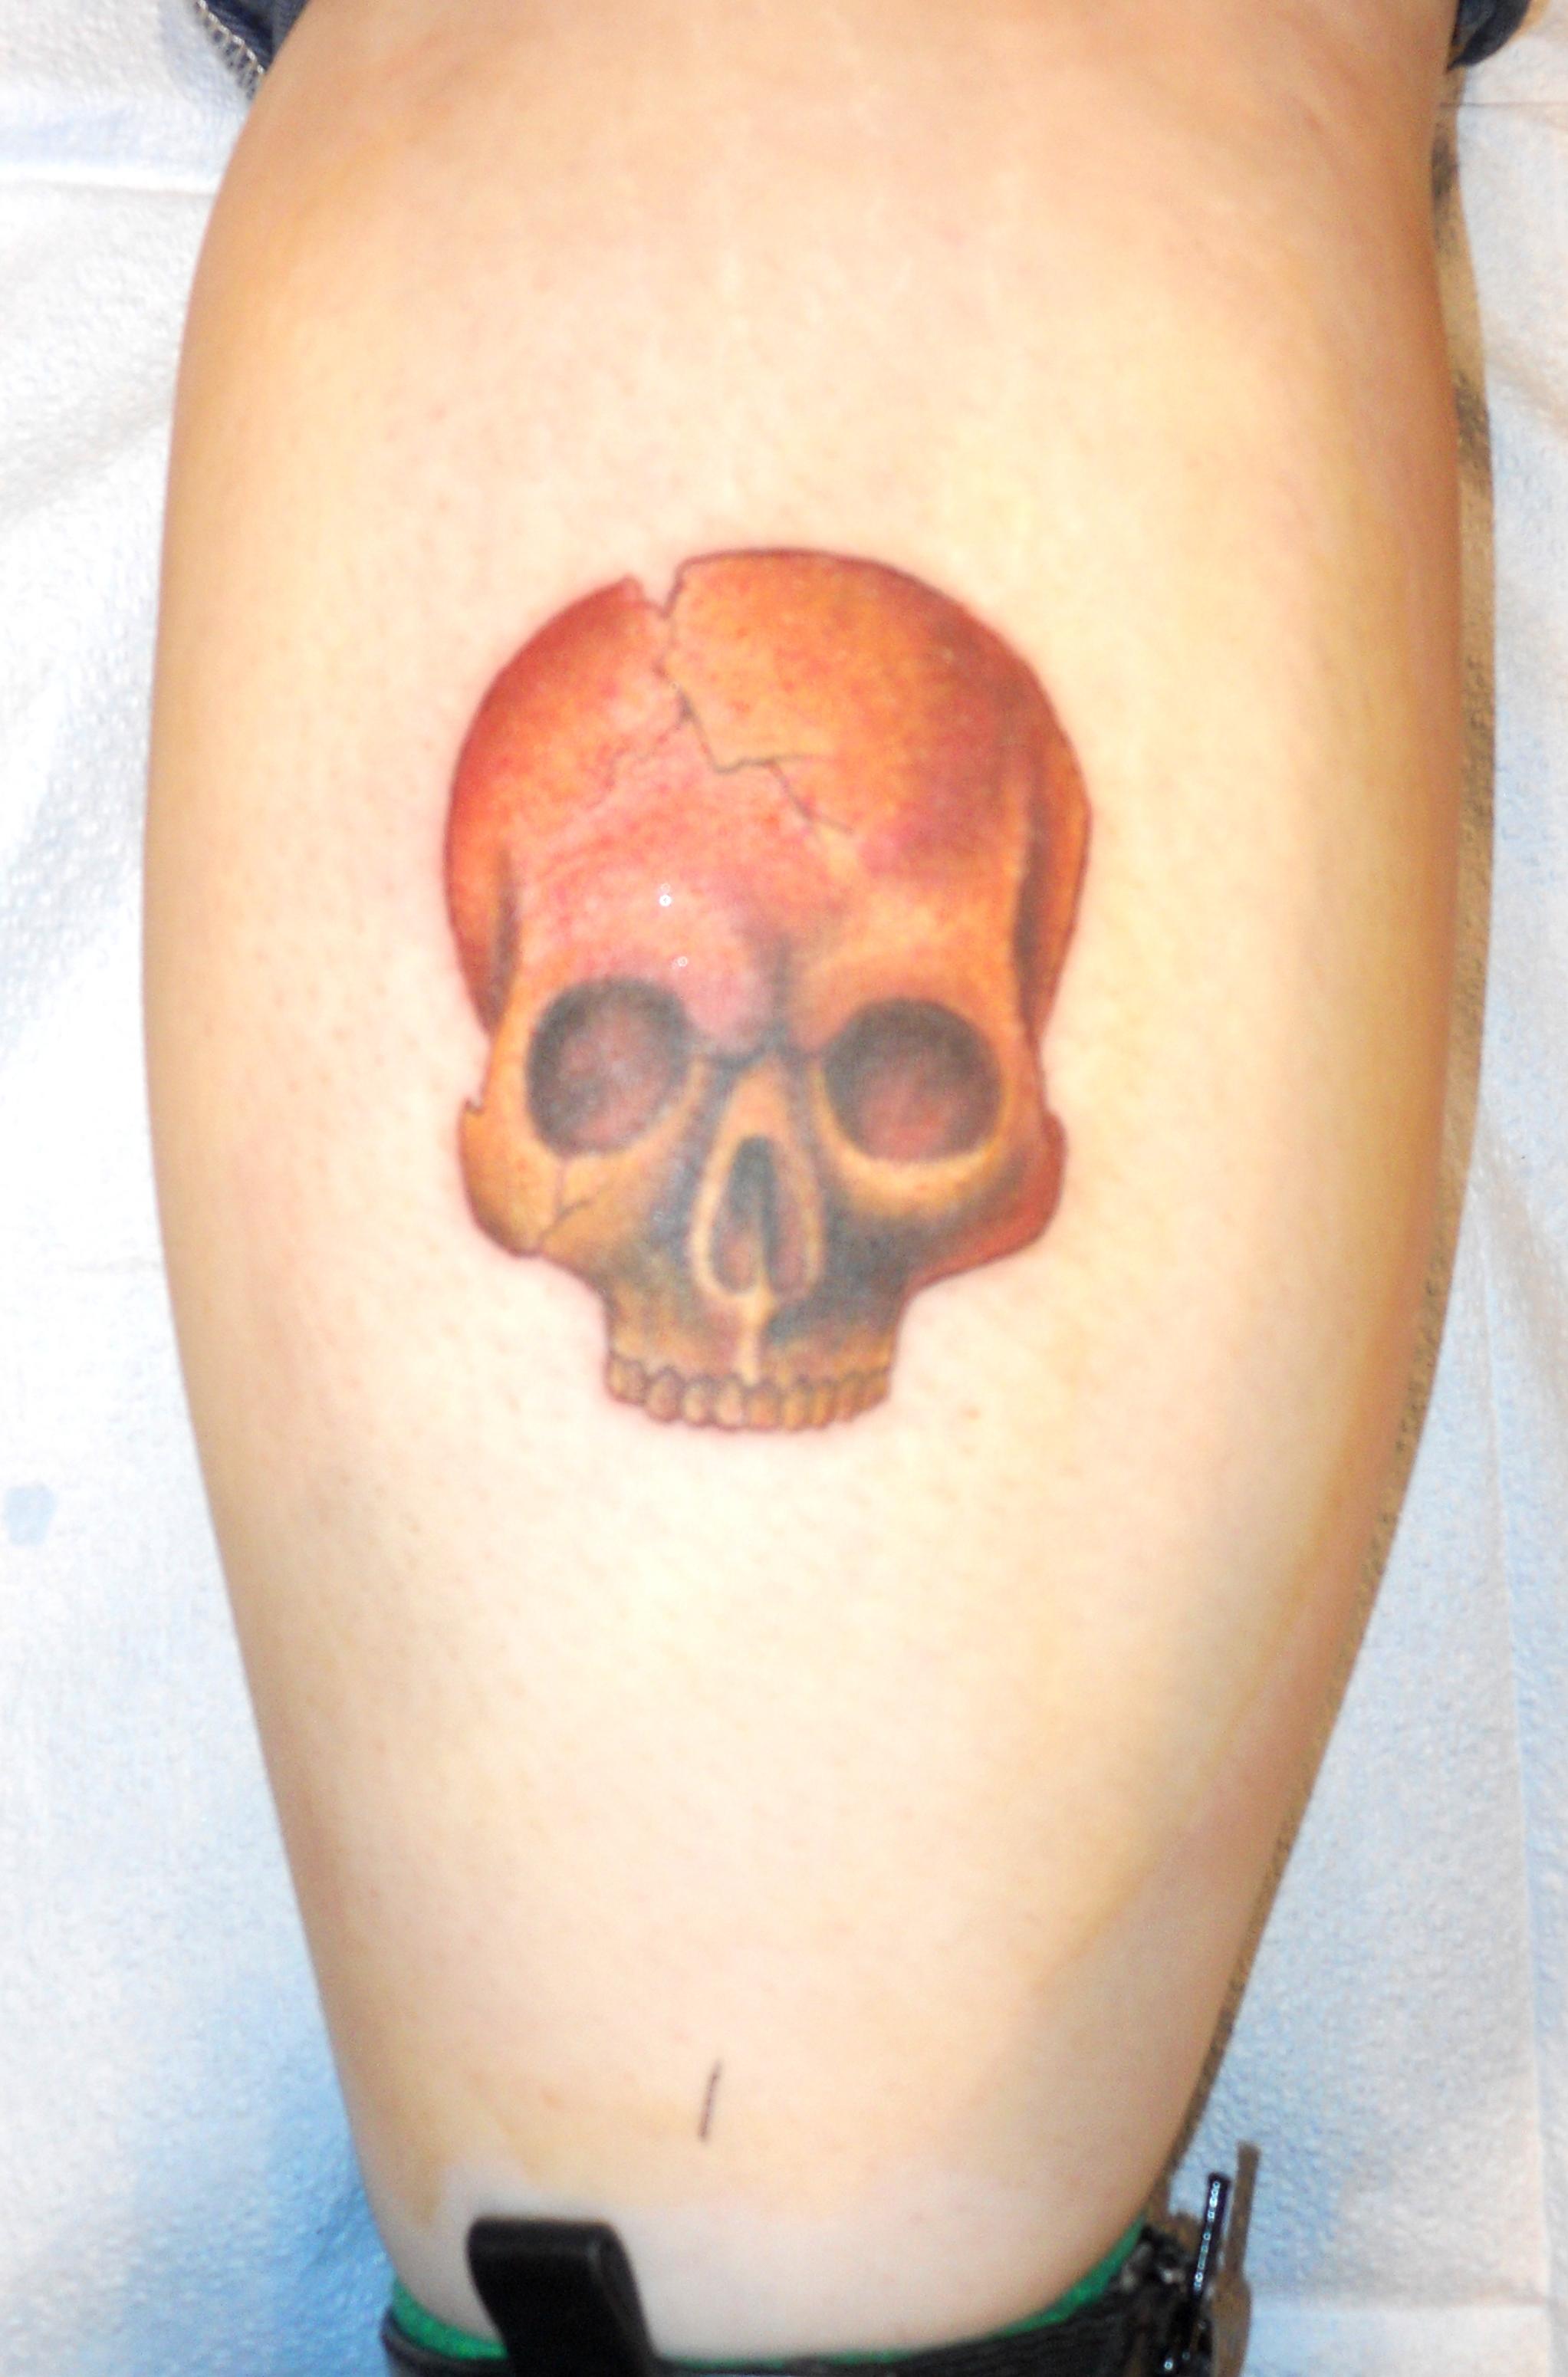 If you got a tattoo,